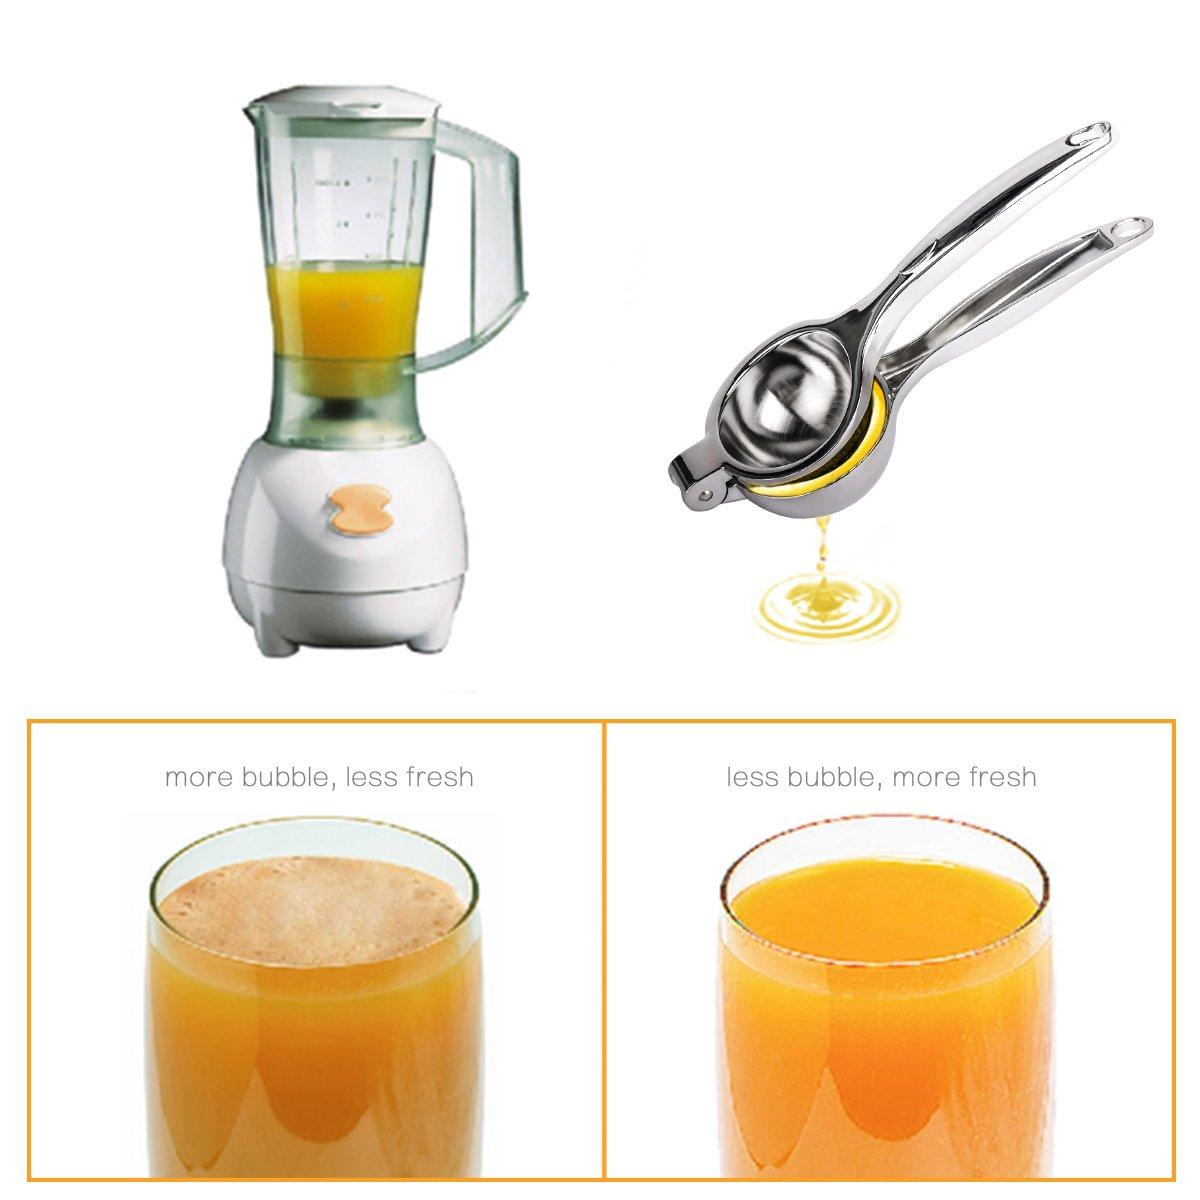 Dishwasher Safe IORIGIN Lemon Lime Squeezer Manual Citrus Press ...